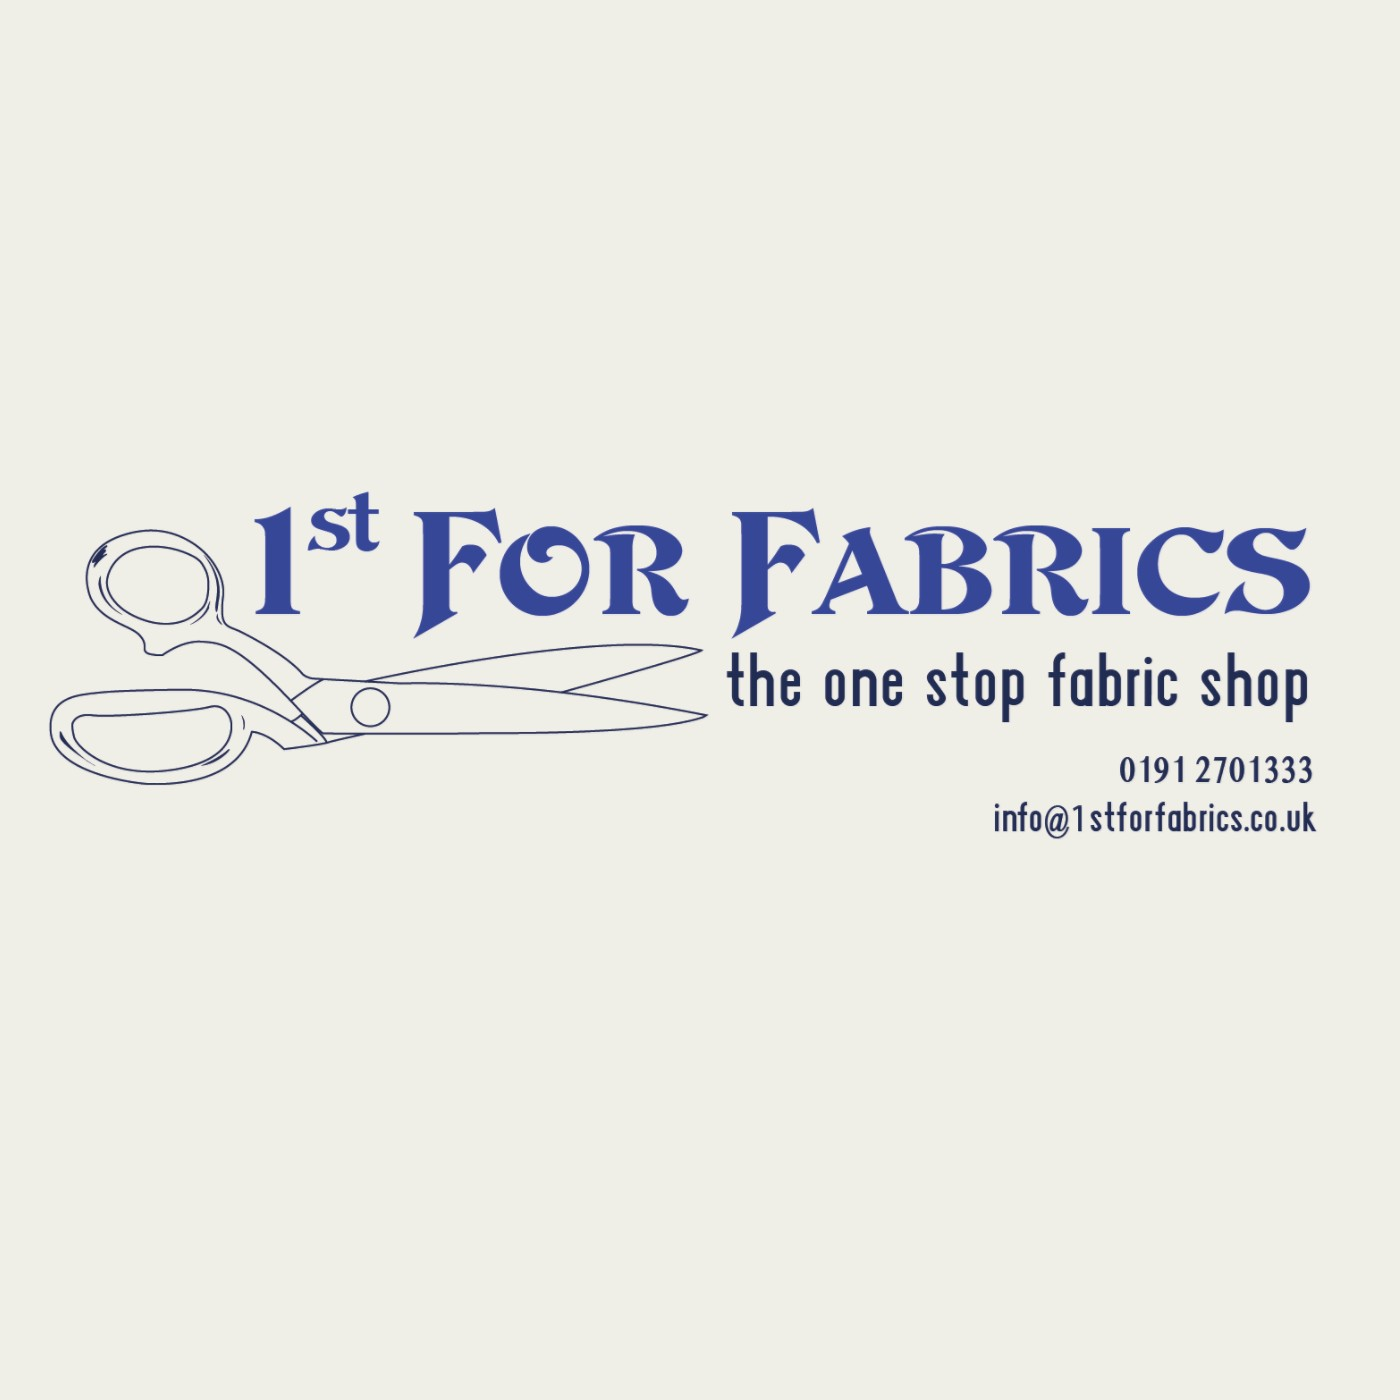 Logo of 1st For Fabrics